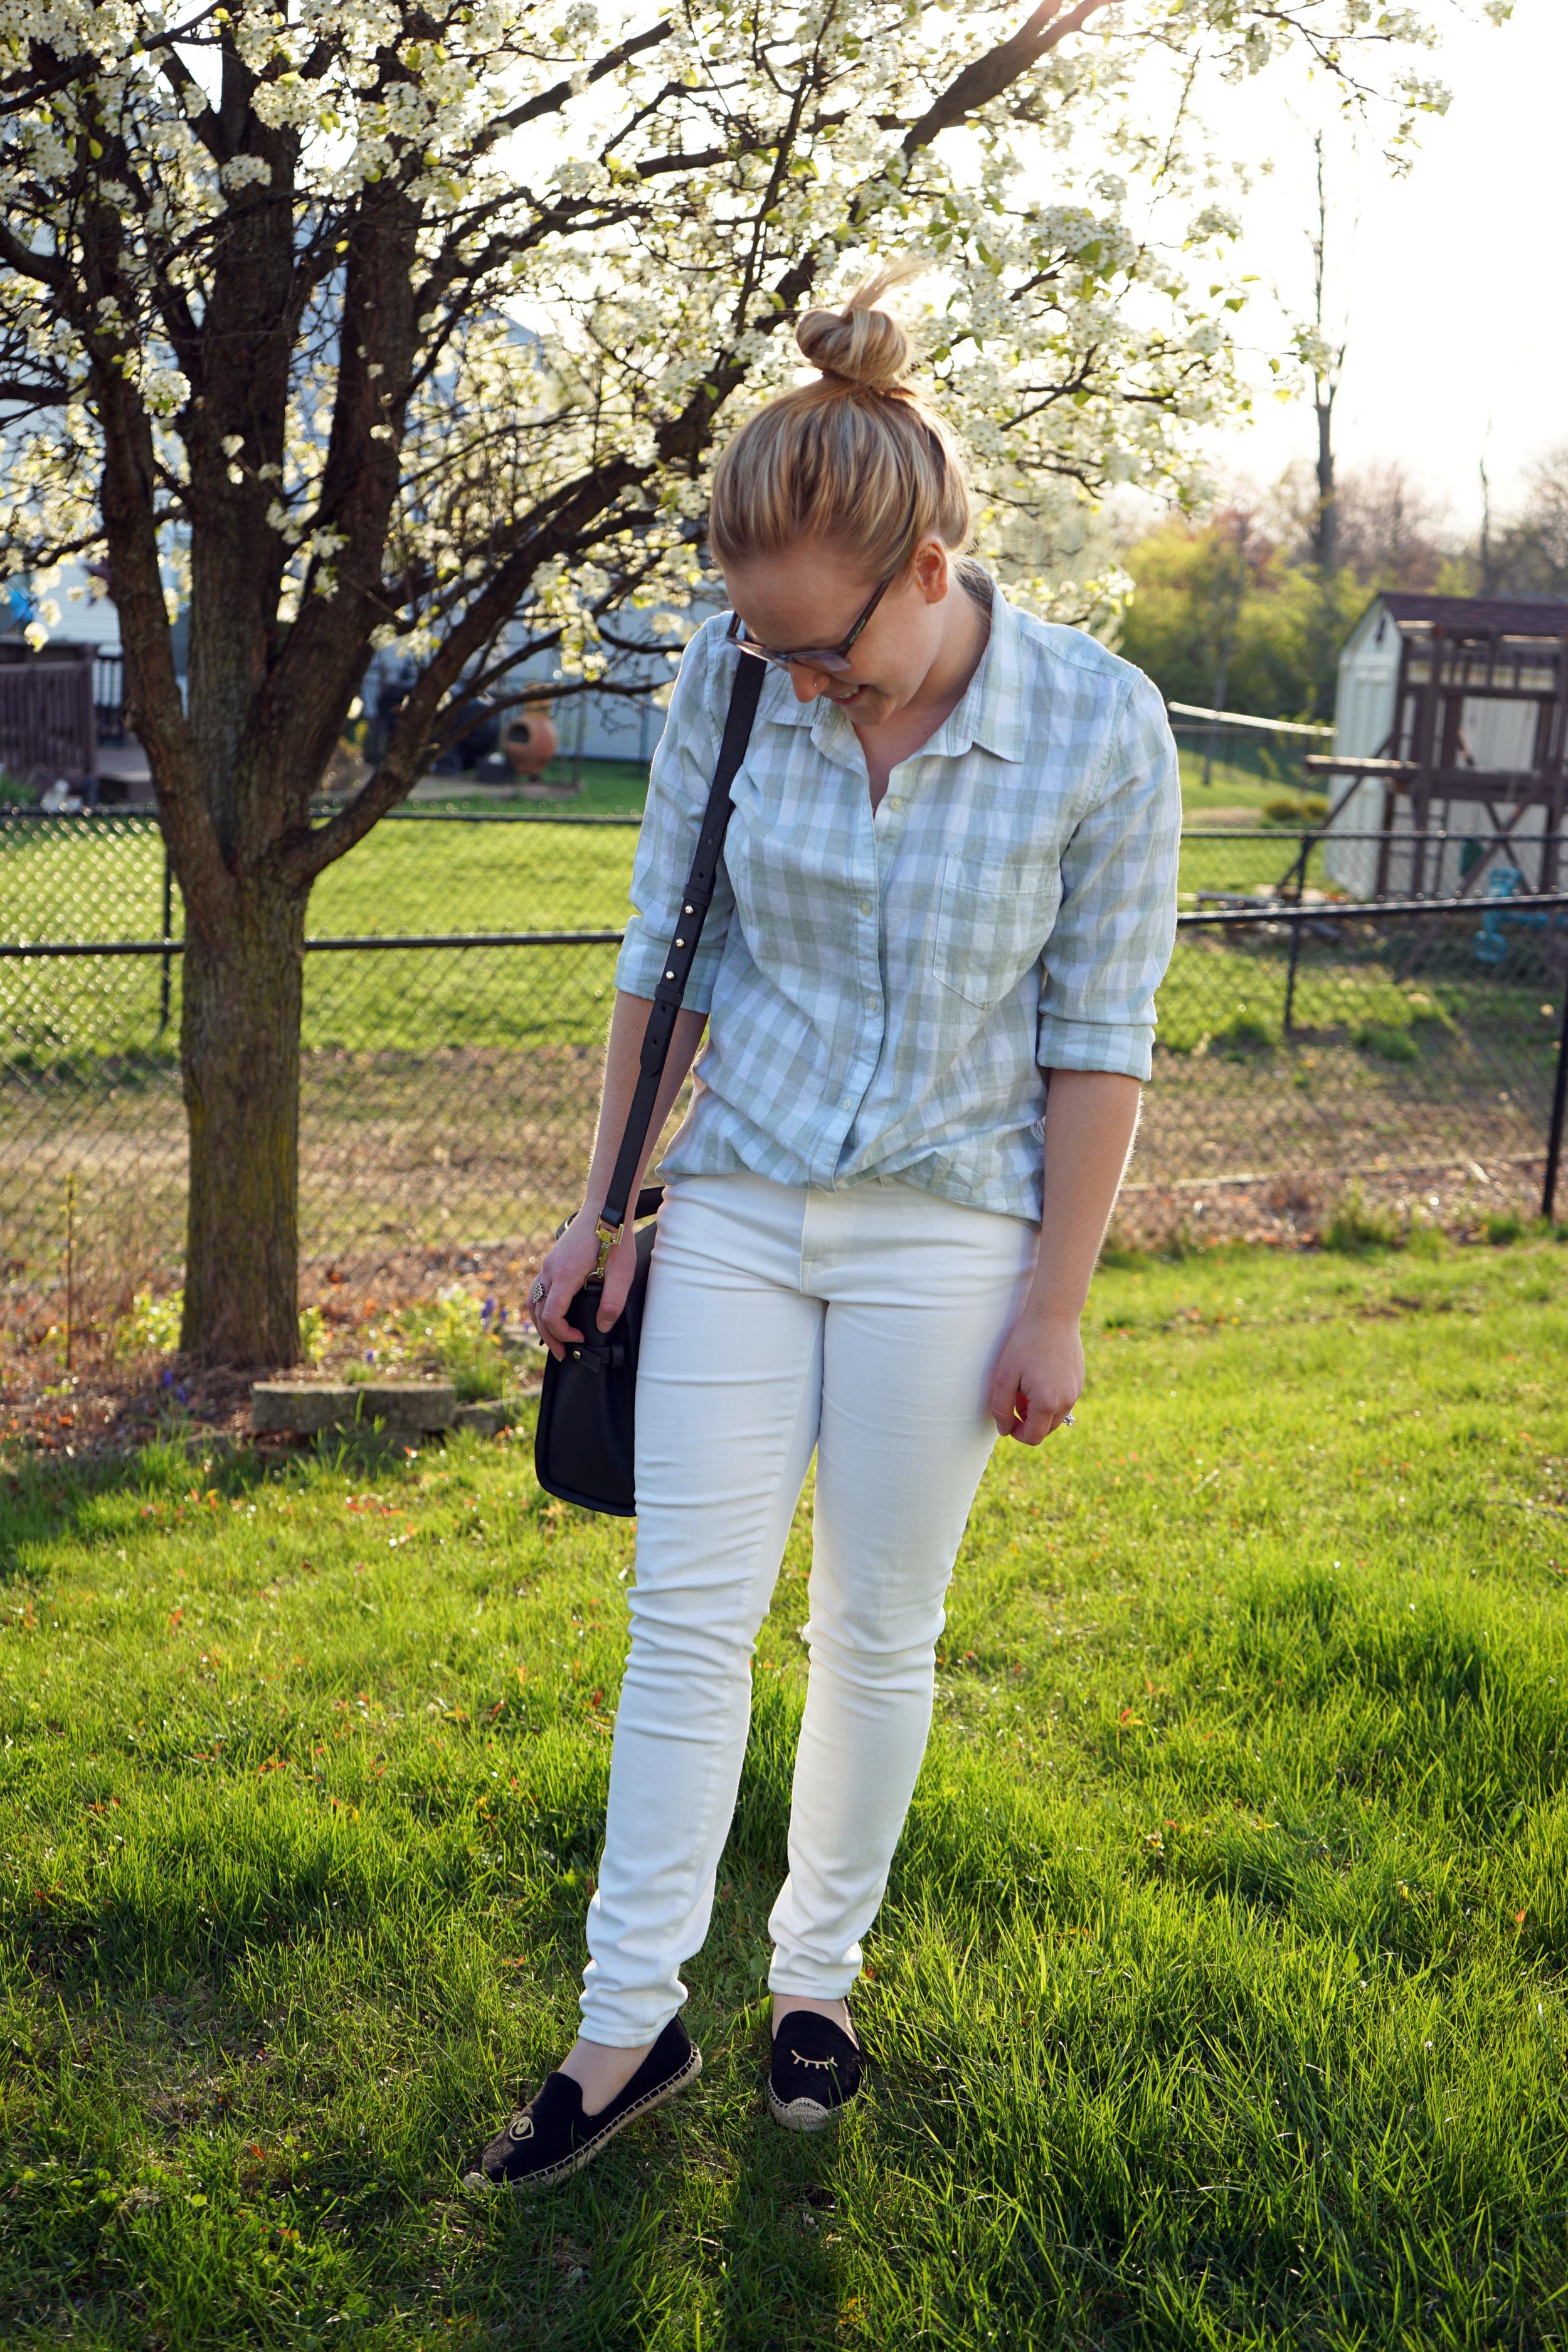 Soludos x Jason Polan winking eye espadrille flats, Madewell skinny jeans (pure white), Gap flannel shirt, Luana Italy paley satchel purse - Maggie a la Mode